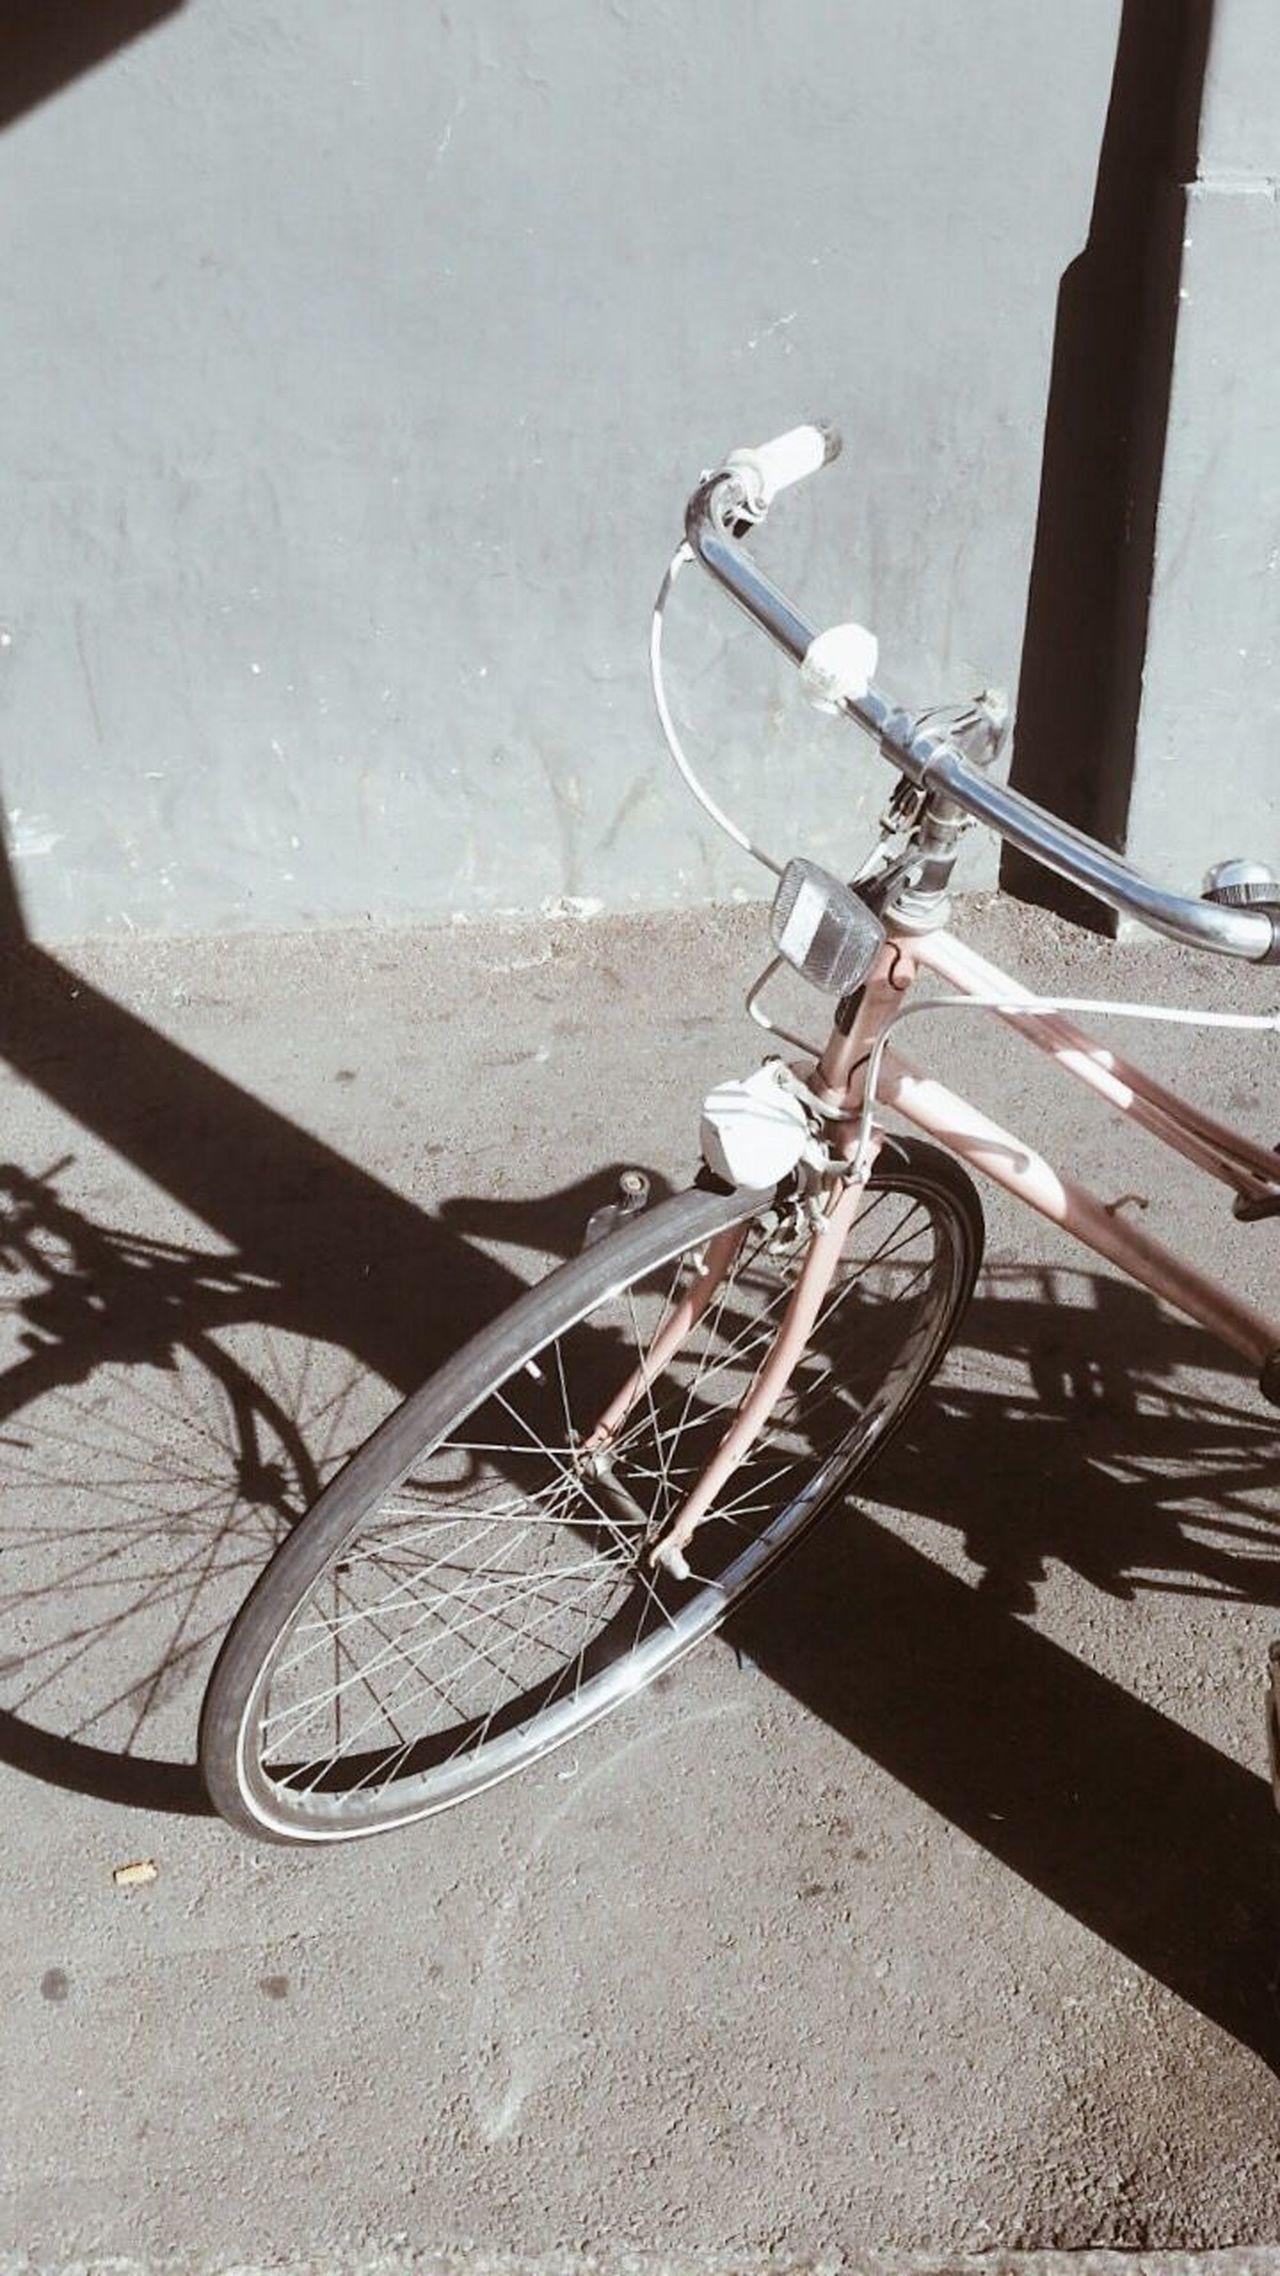 Bicycle Mode Of Transport Transportation Contrast Bicycle Rack Urban City The Street Photographer - 2017 EyeEm Awards